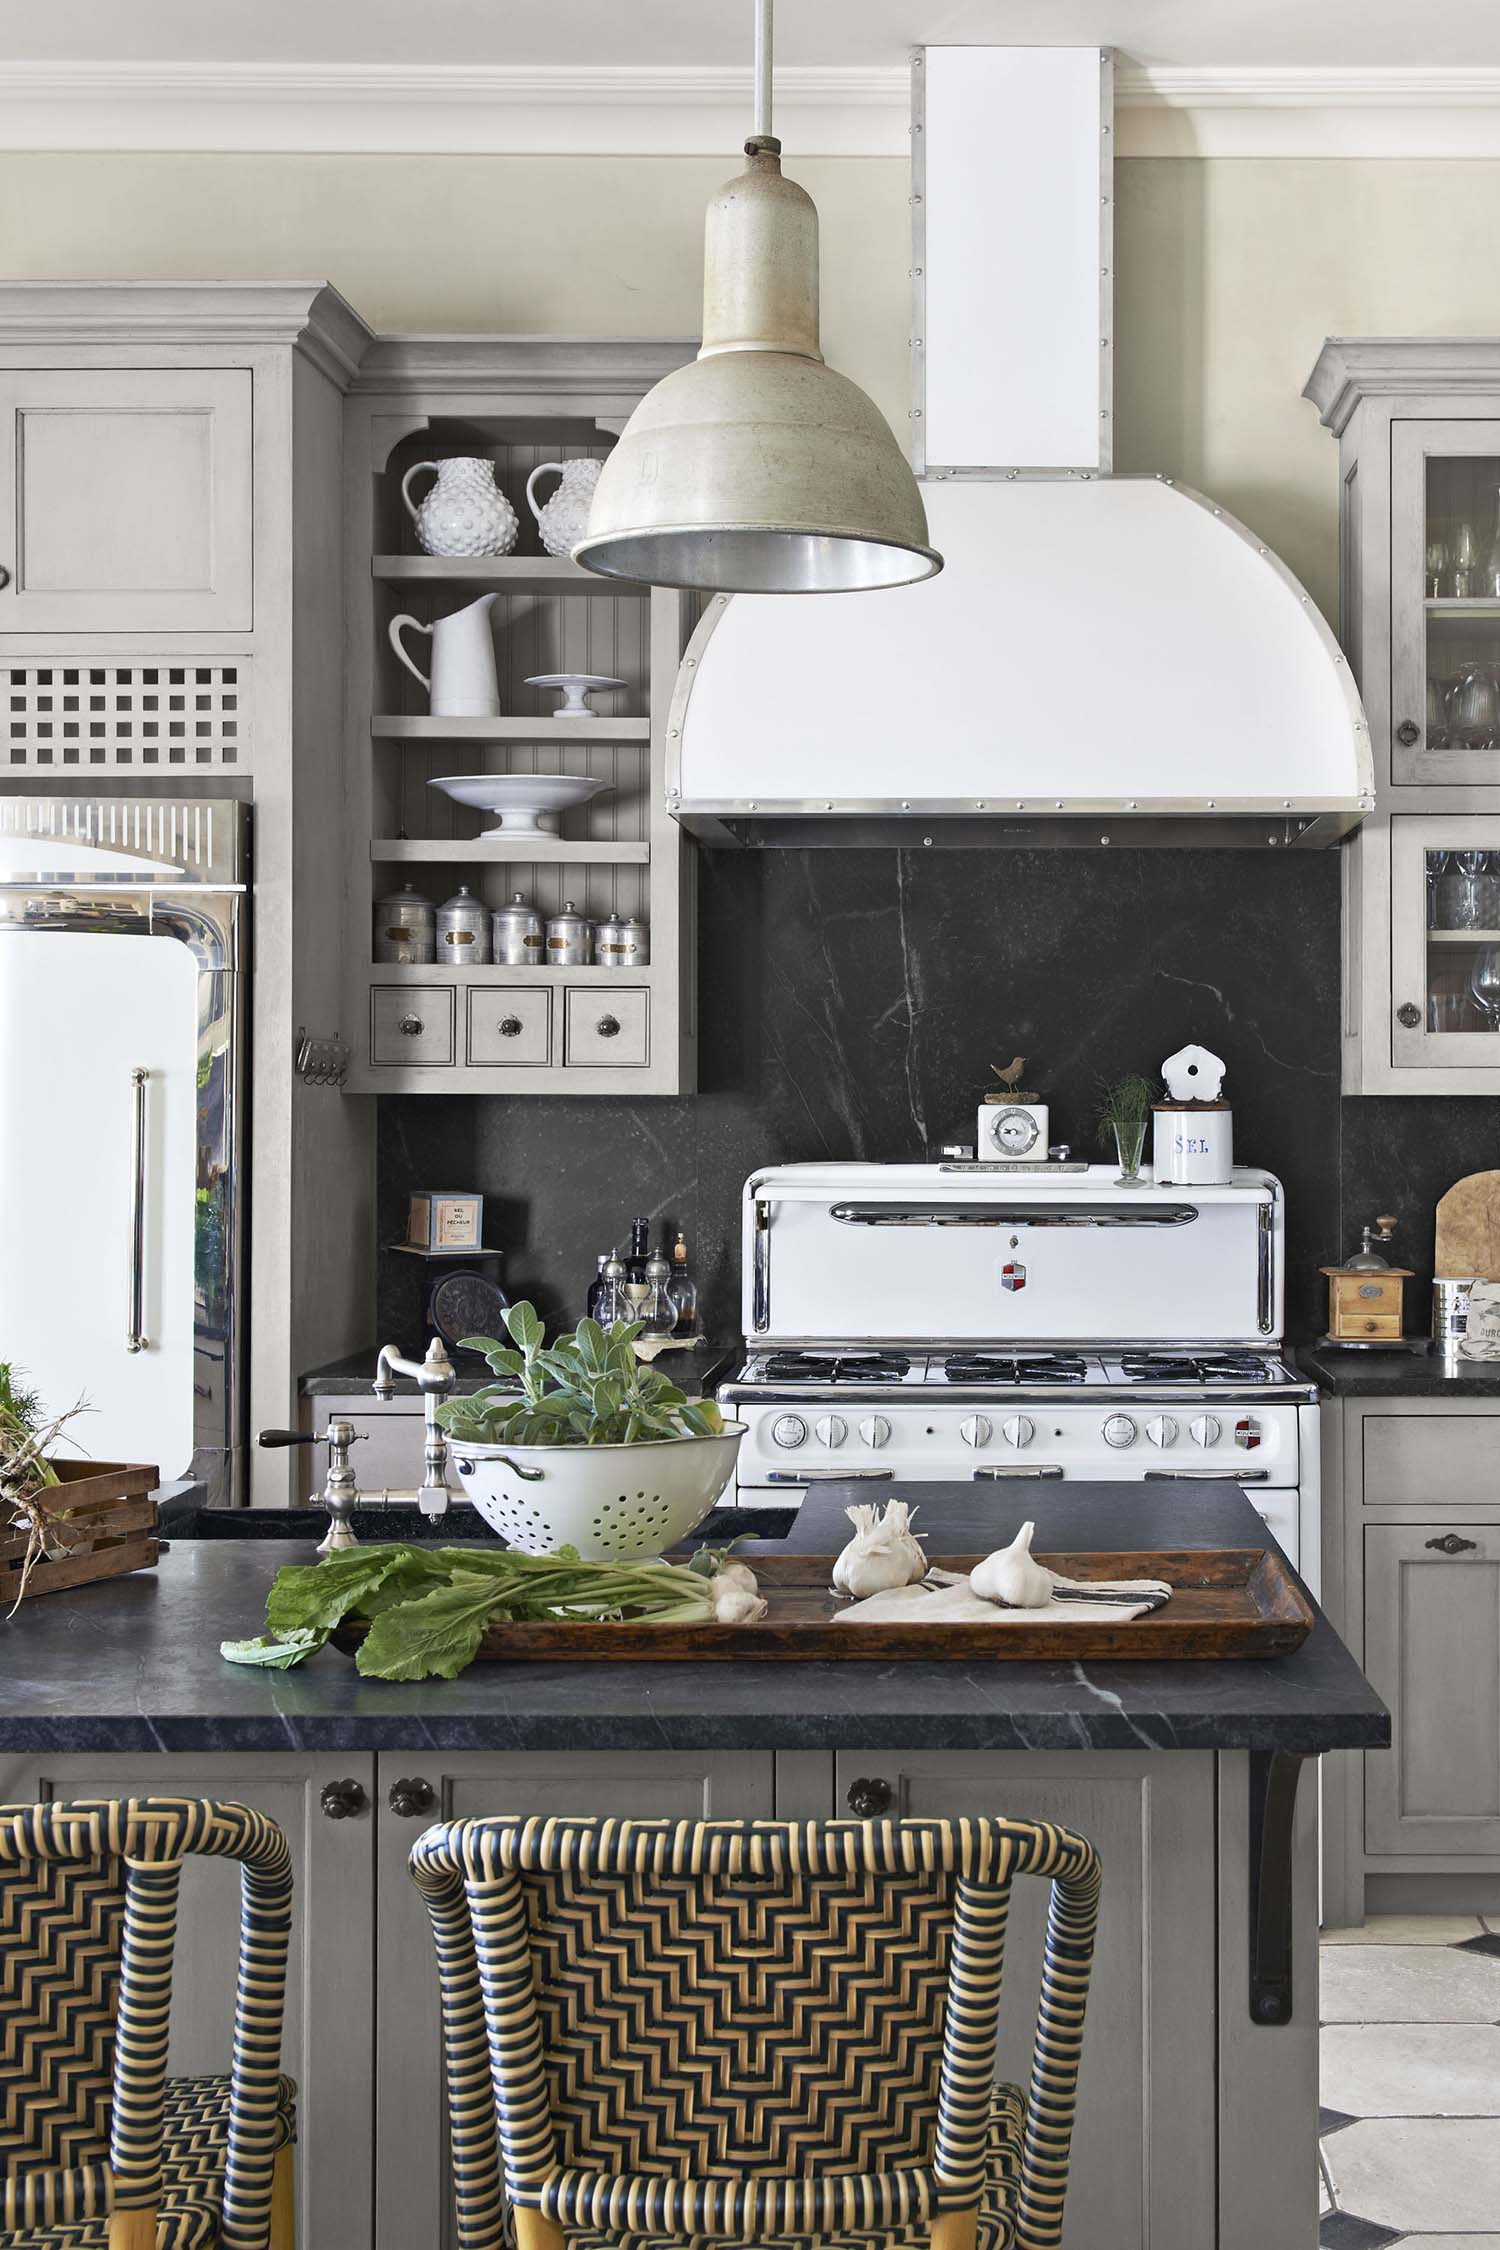 solid black granite backsplash gray cabinets white appliances